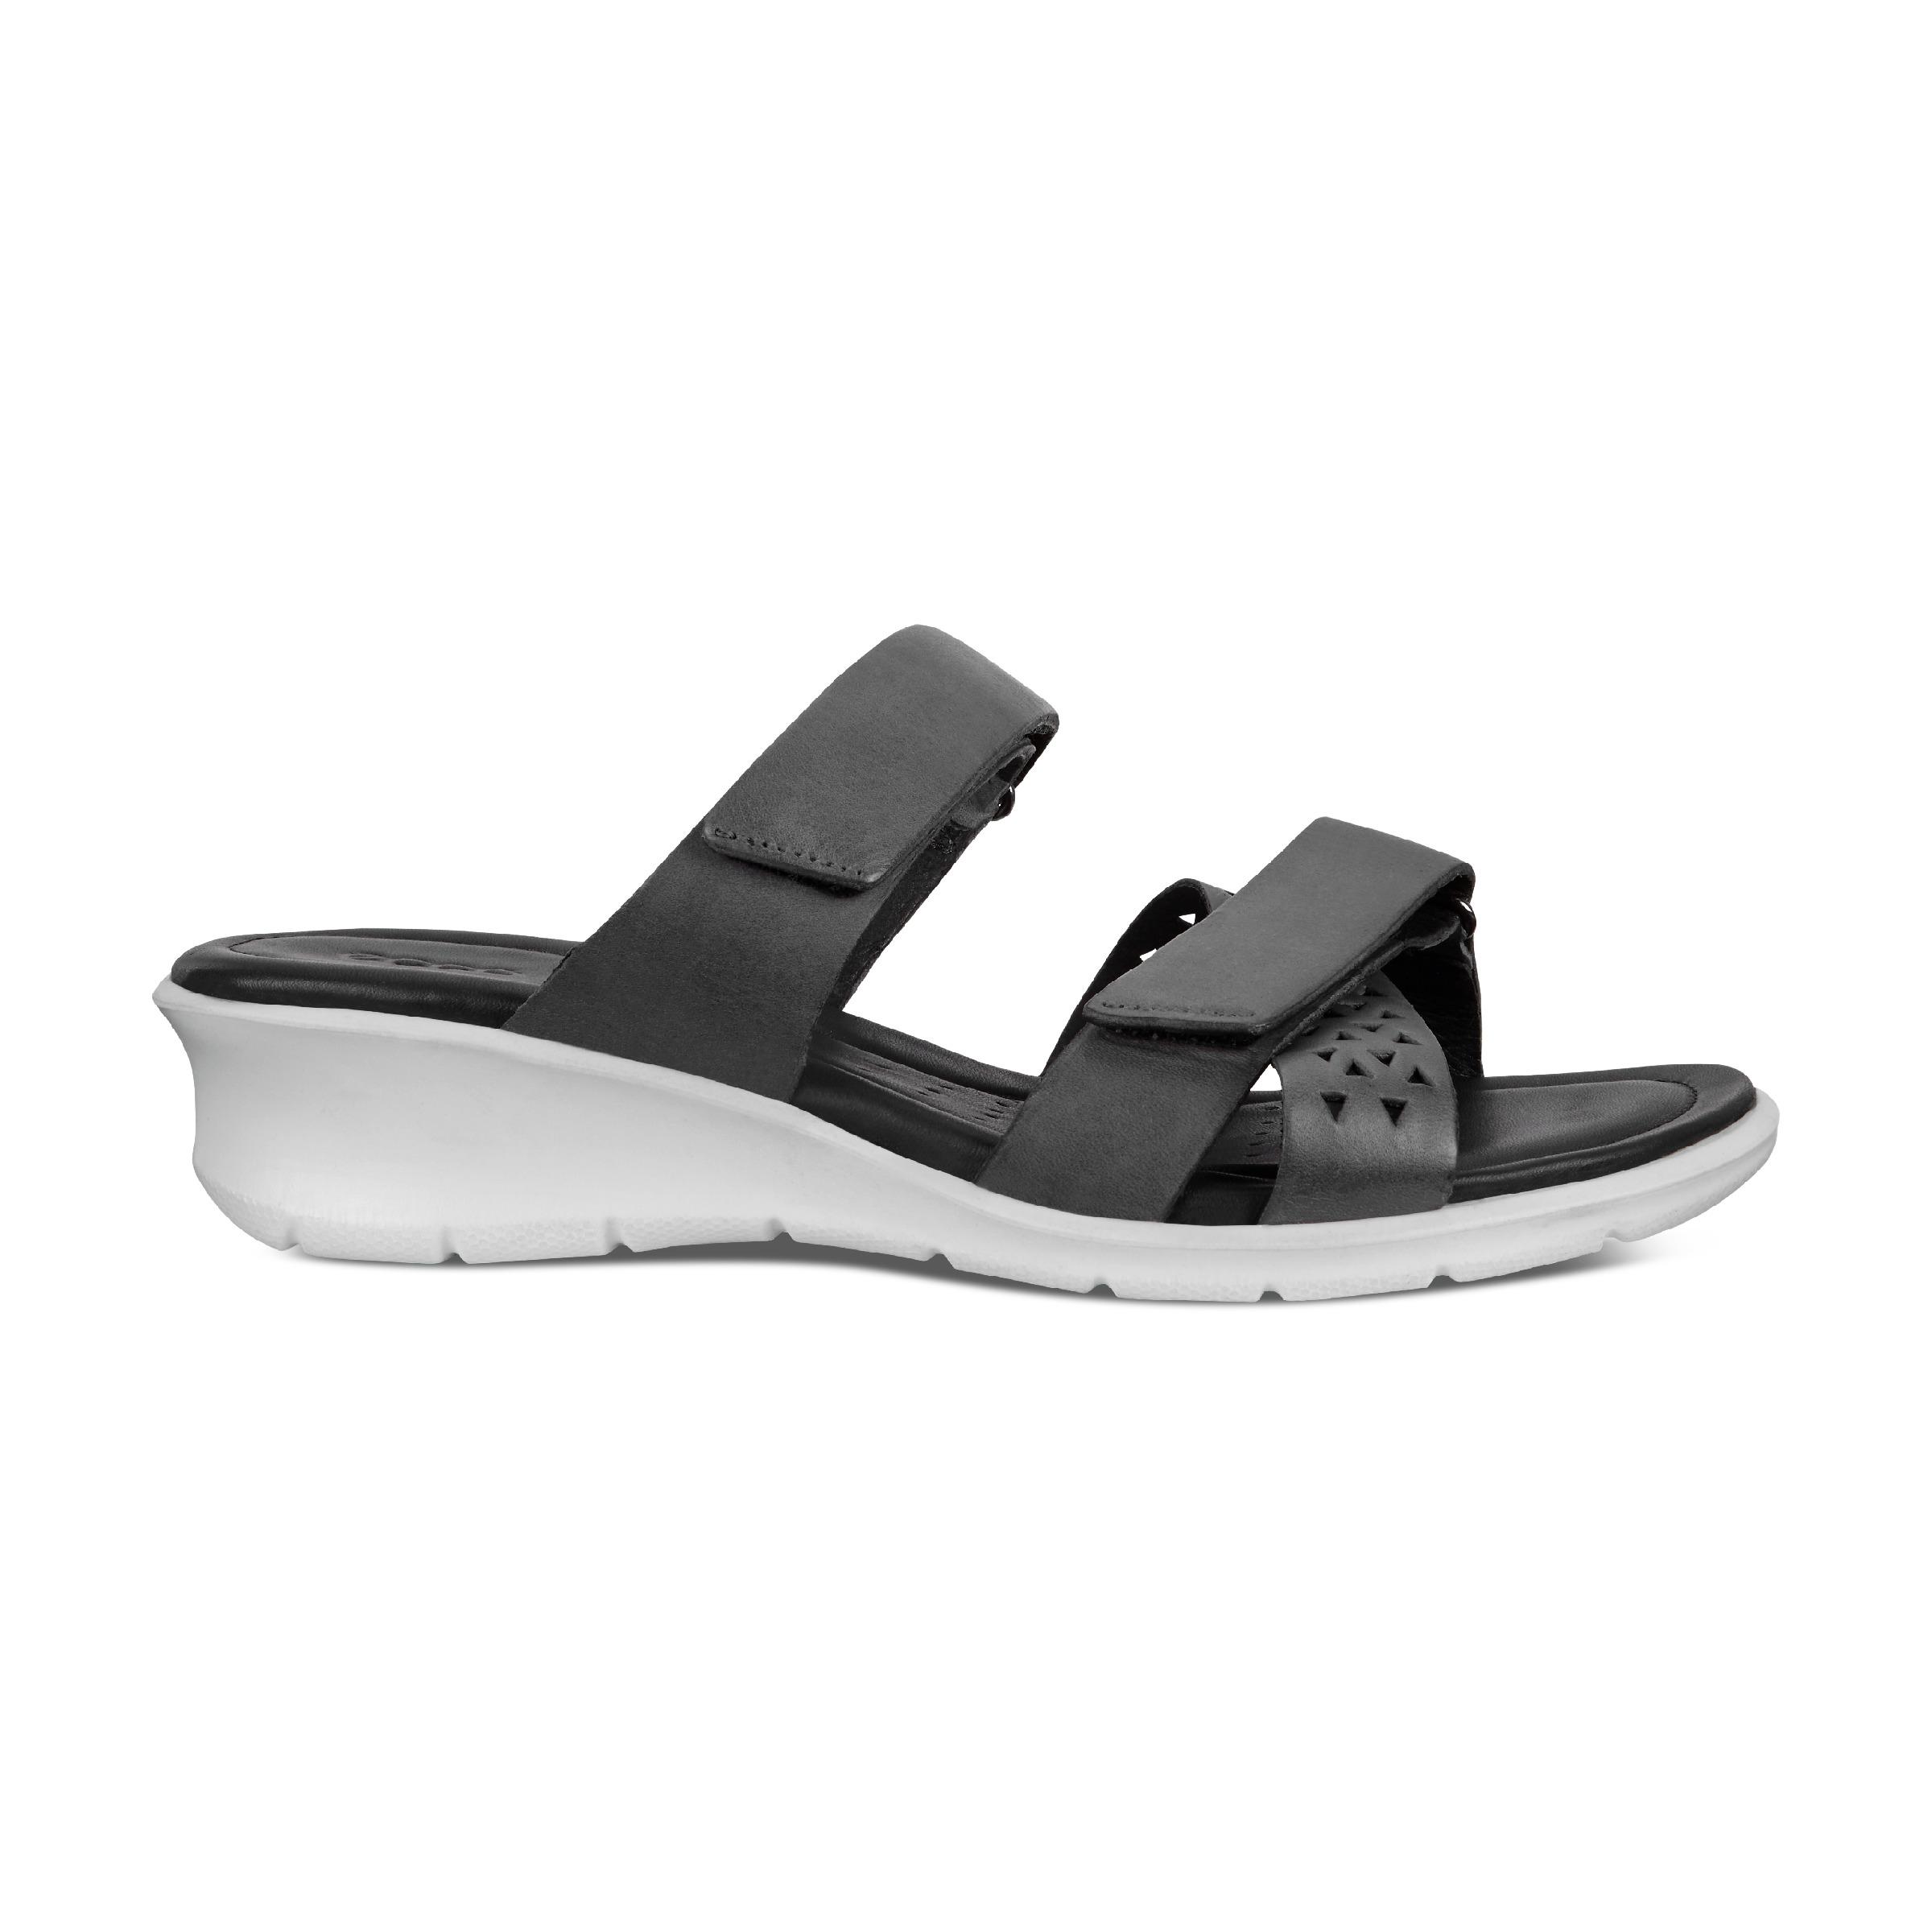 ECCO Felicia Sandal Heeled San Size 7-7.5 Black